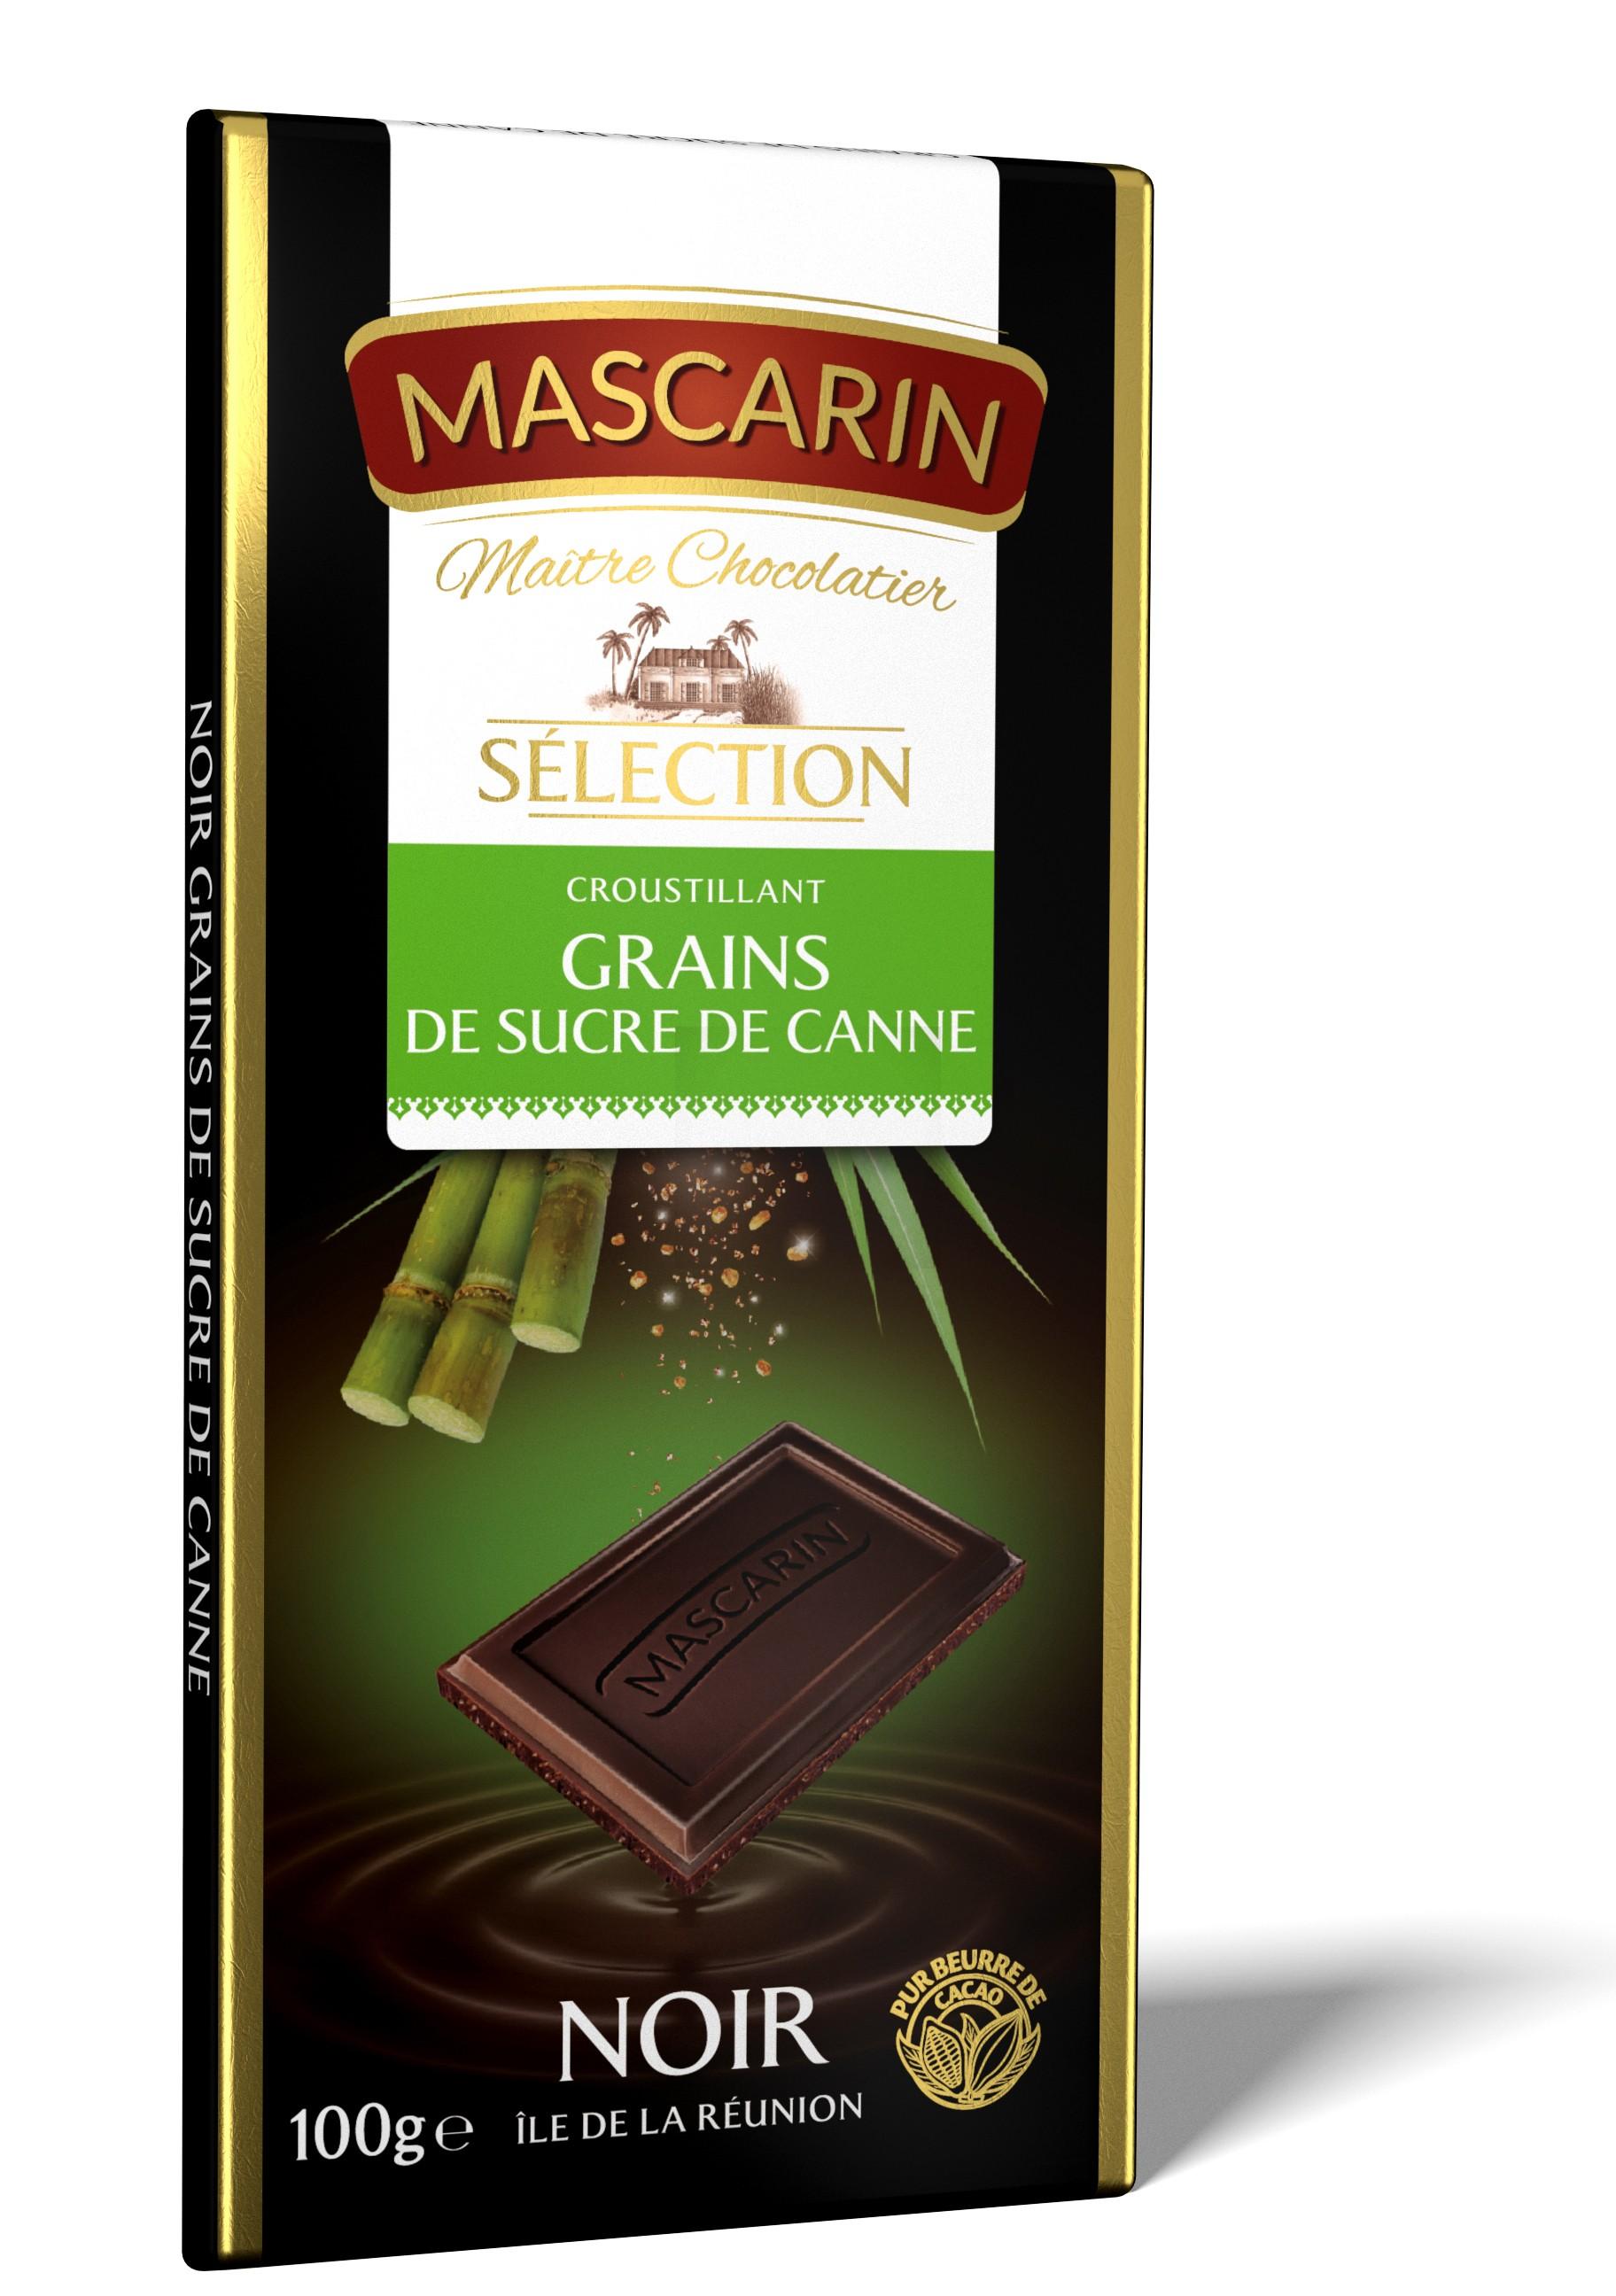 Mascarin dark crunchy cane sugar crystals for Chambre de sucre gourmet artisanal sugars